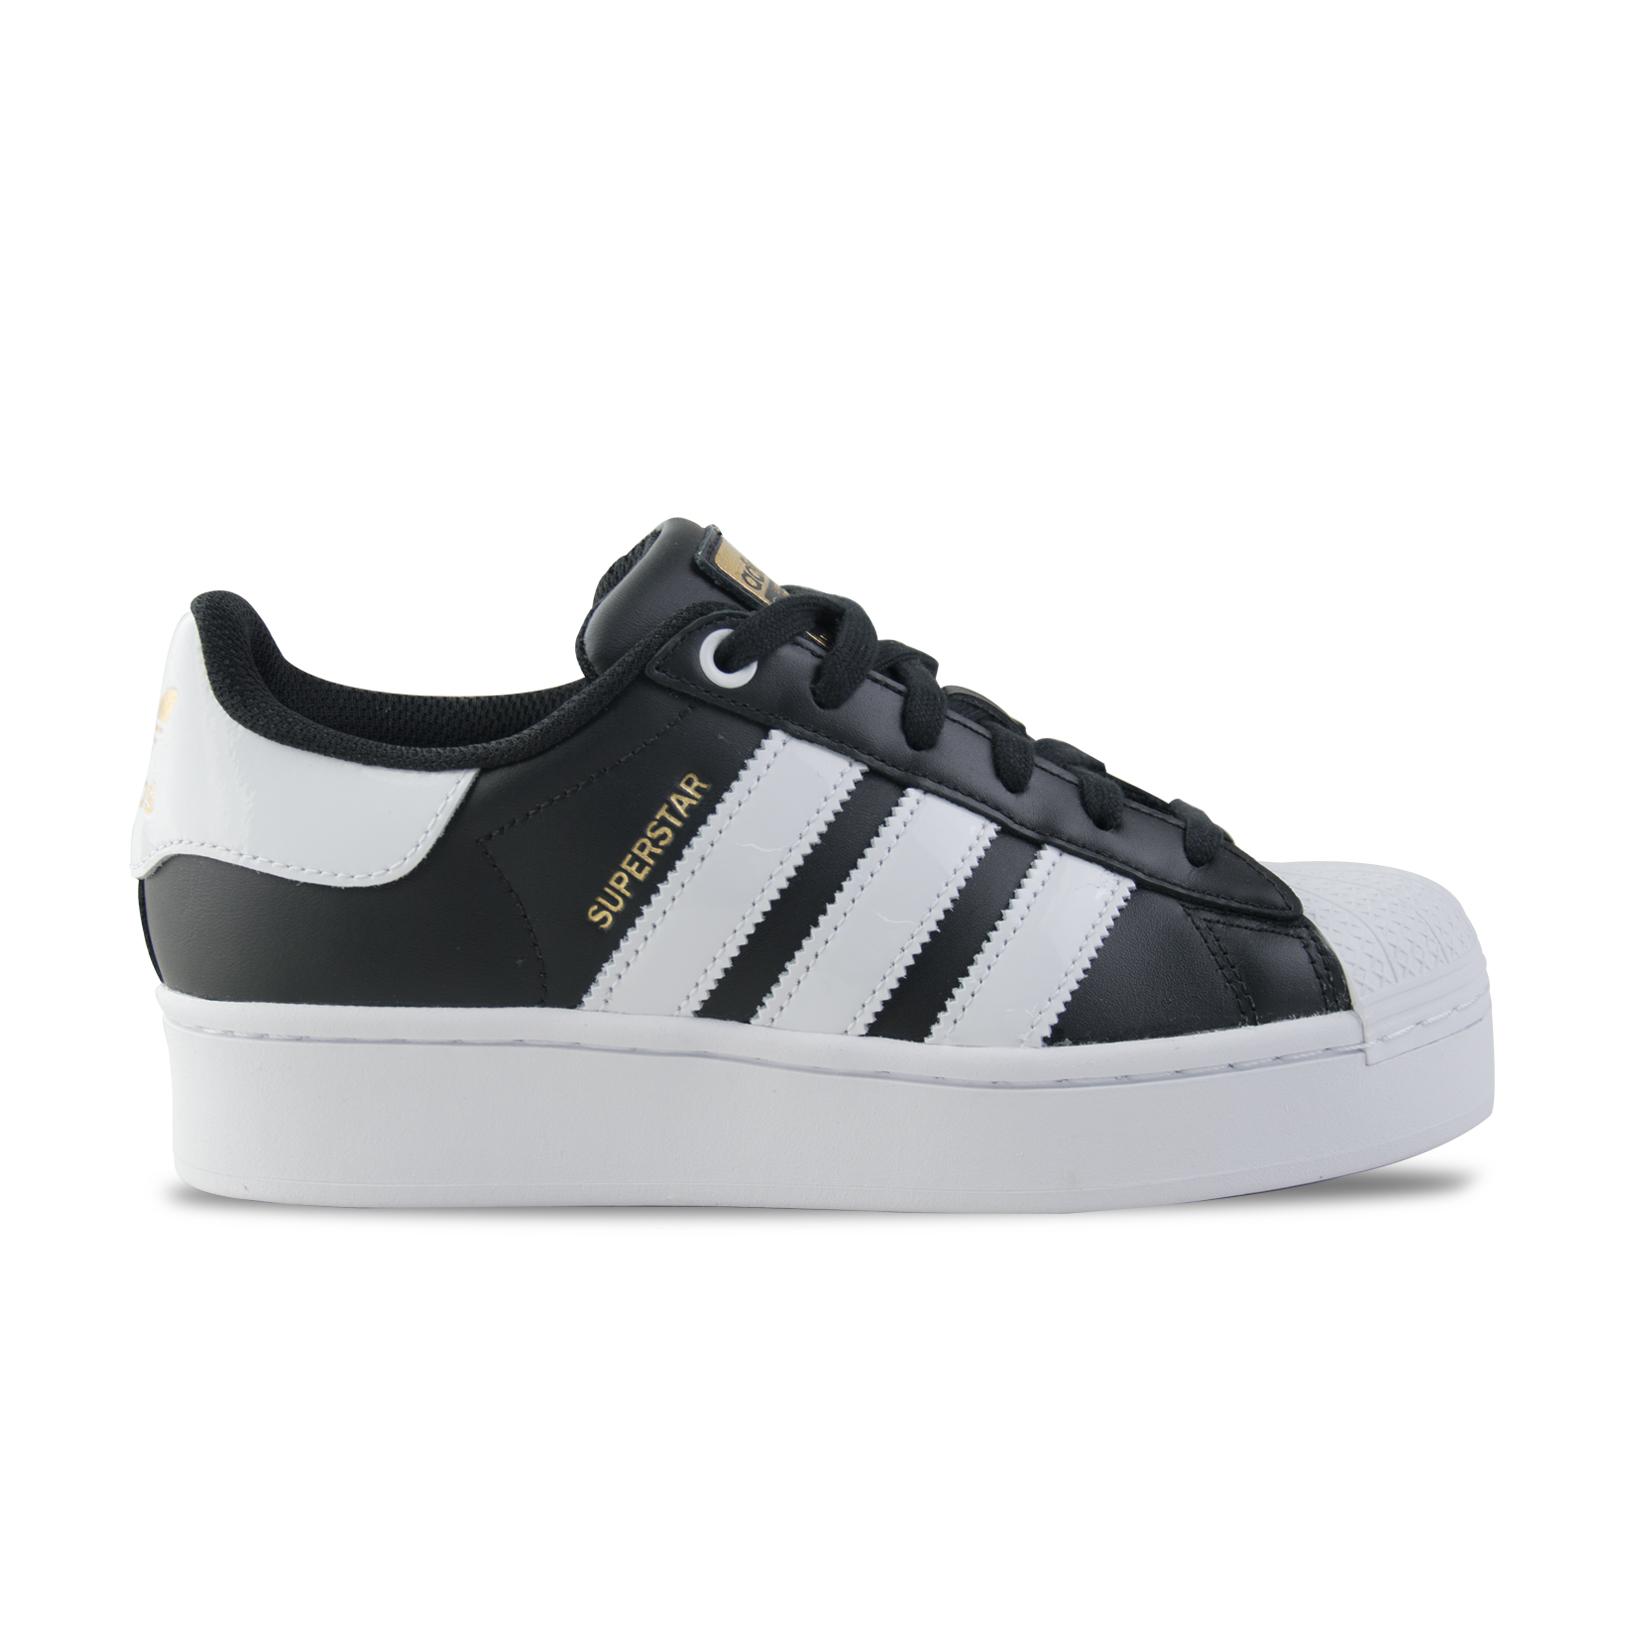 Adidas Originals Superstar Bold Black